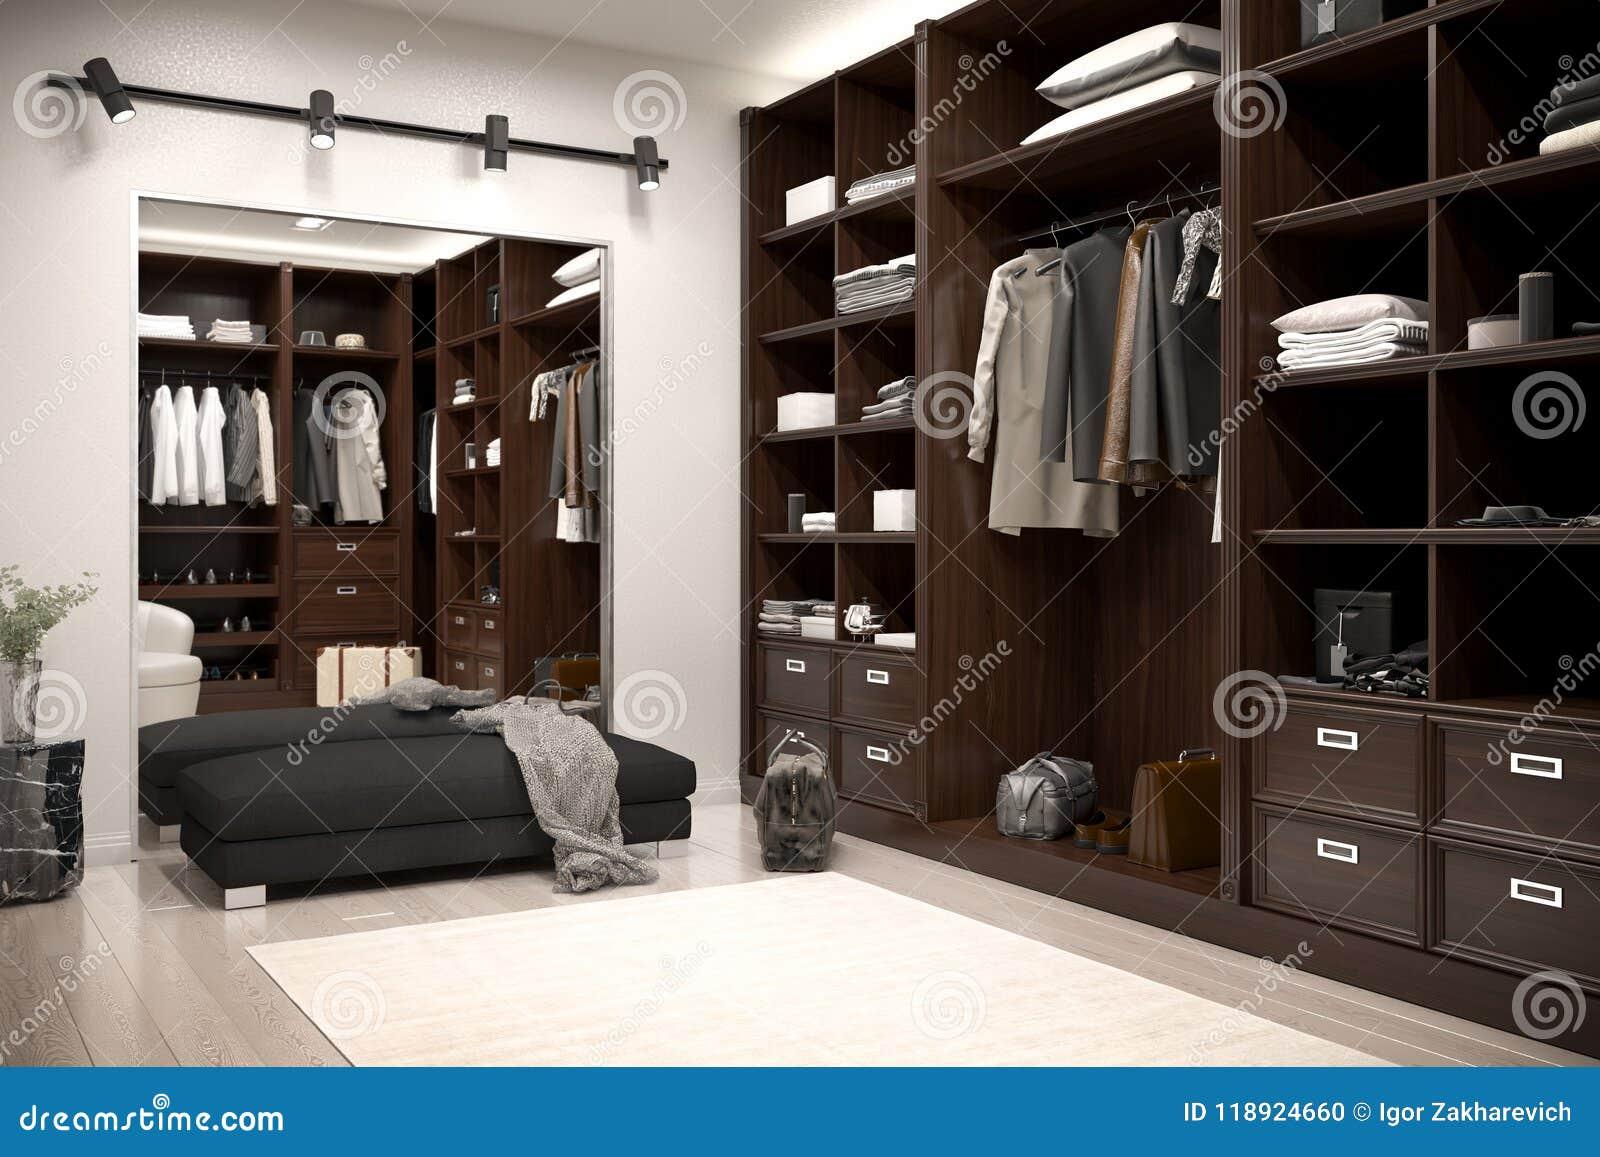 Beautiful wood horizontal wardrobe and walk in closet